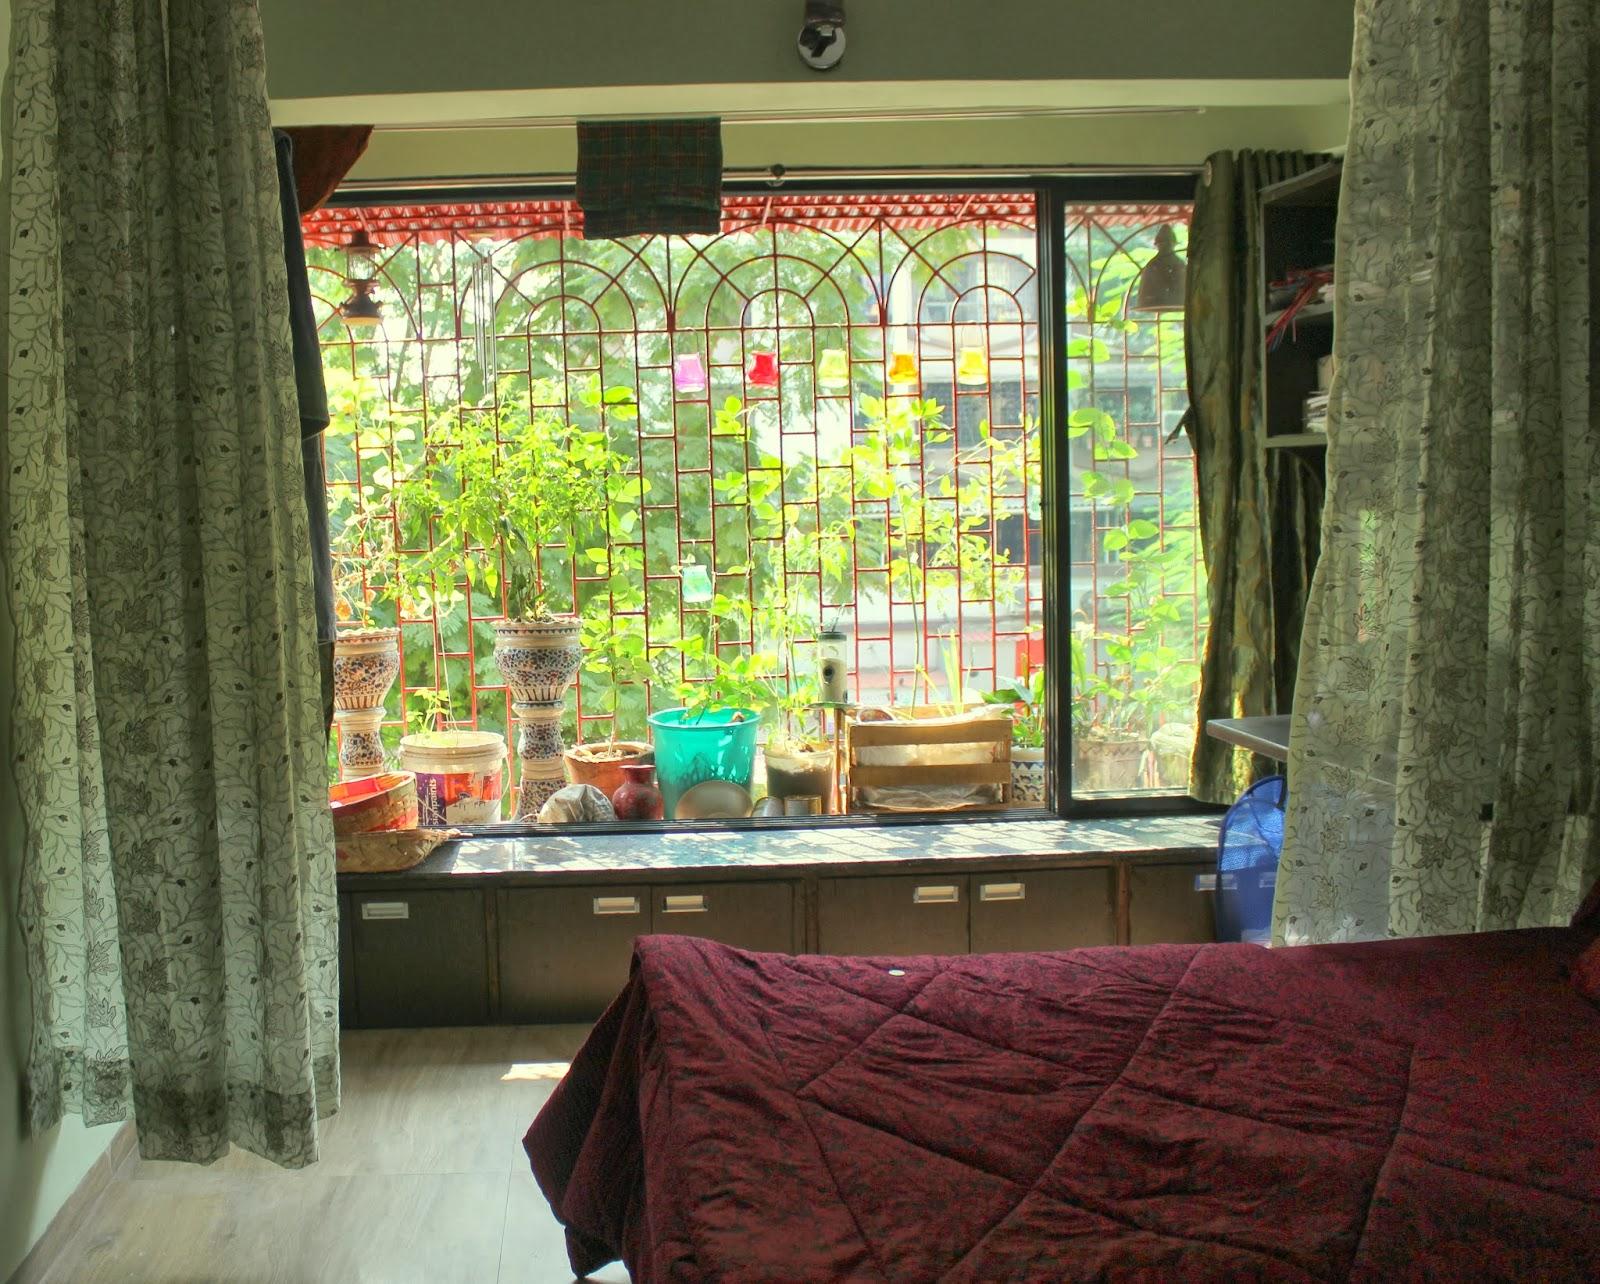 AnnaParabrahma: The Green Balcony Is Back As The Window ...